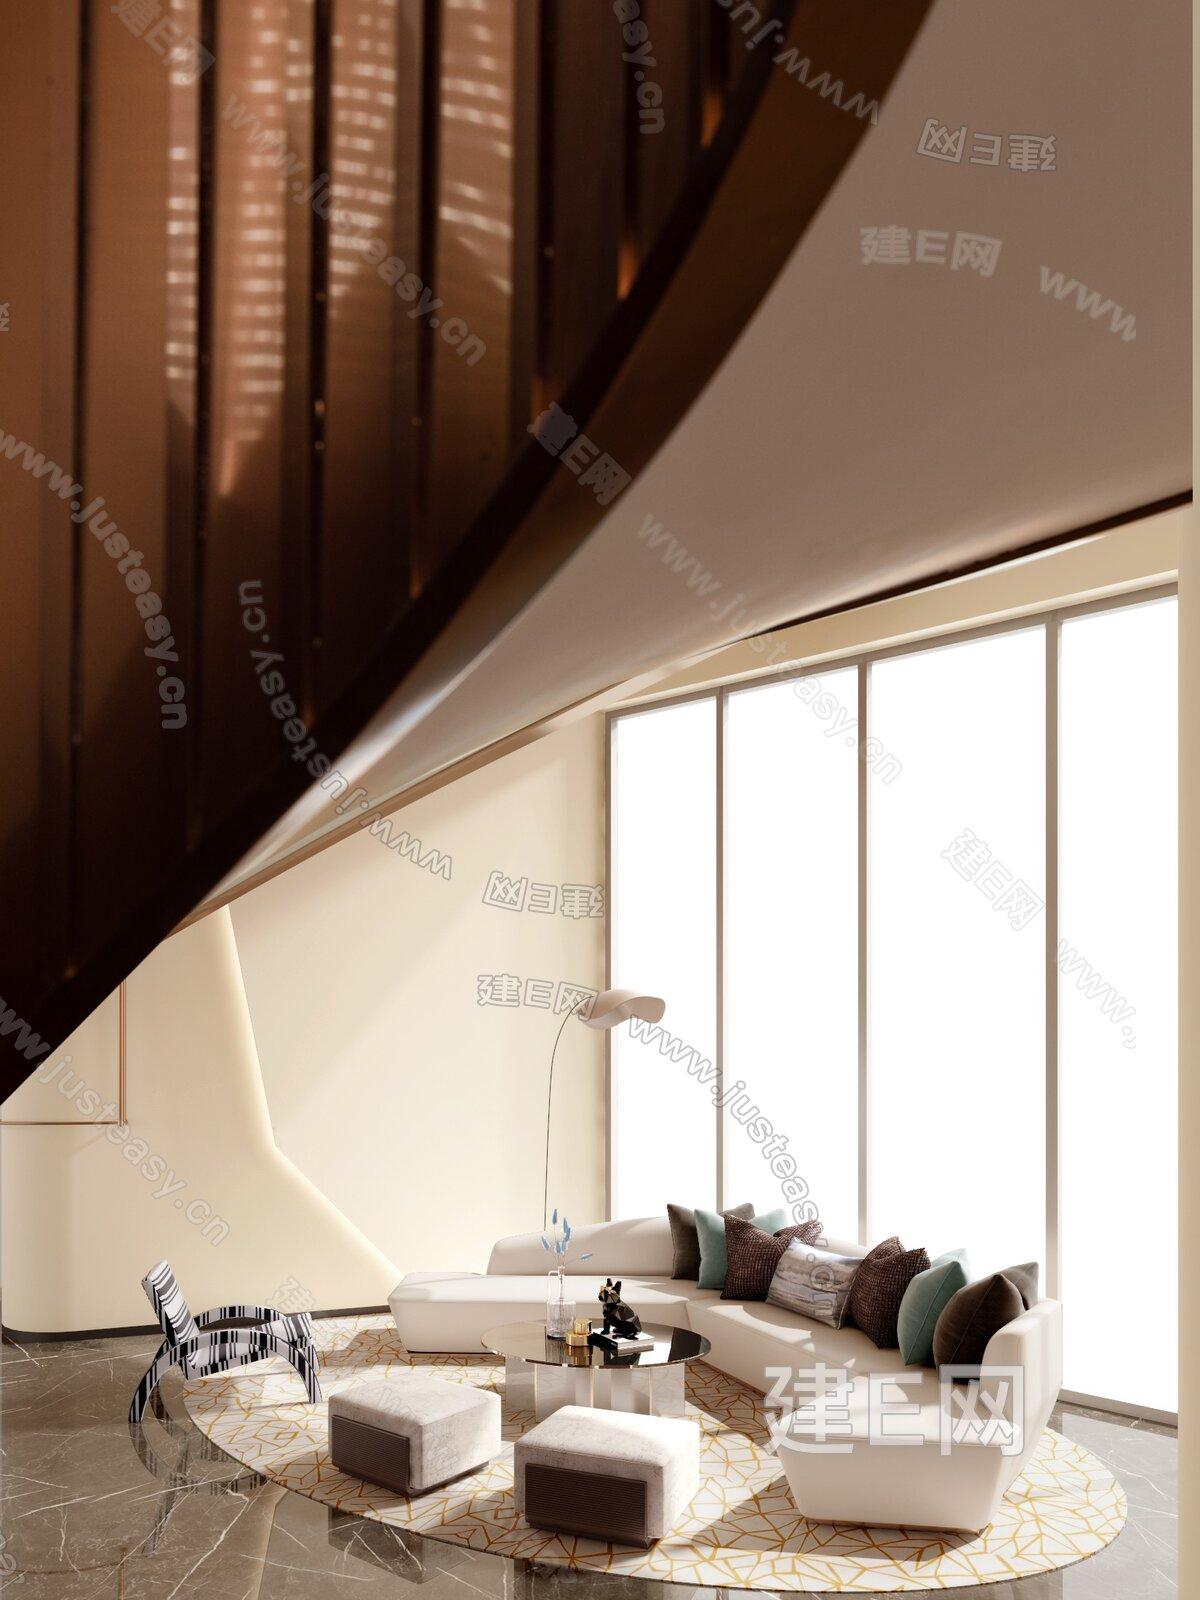 CHY室内设计 现代售楼处接待区3d模型